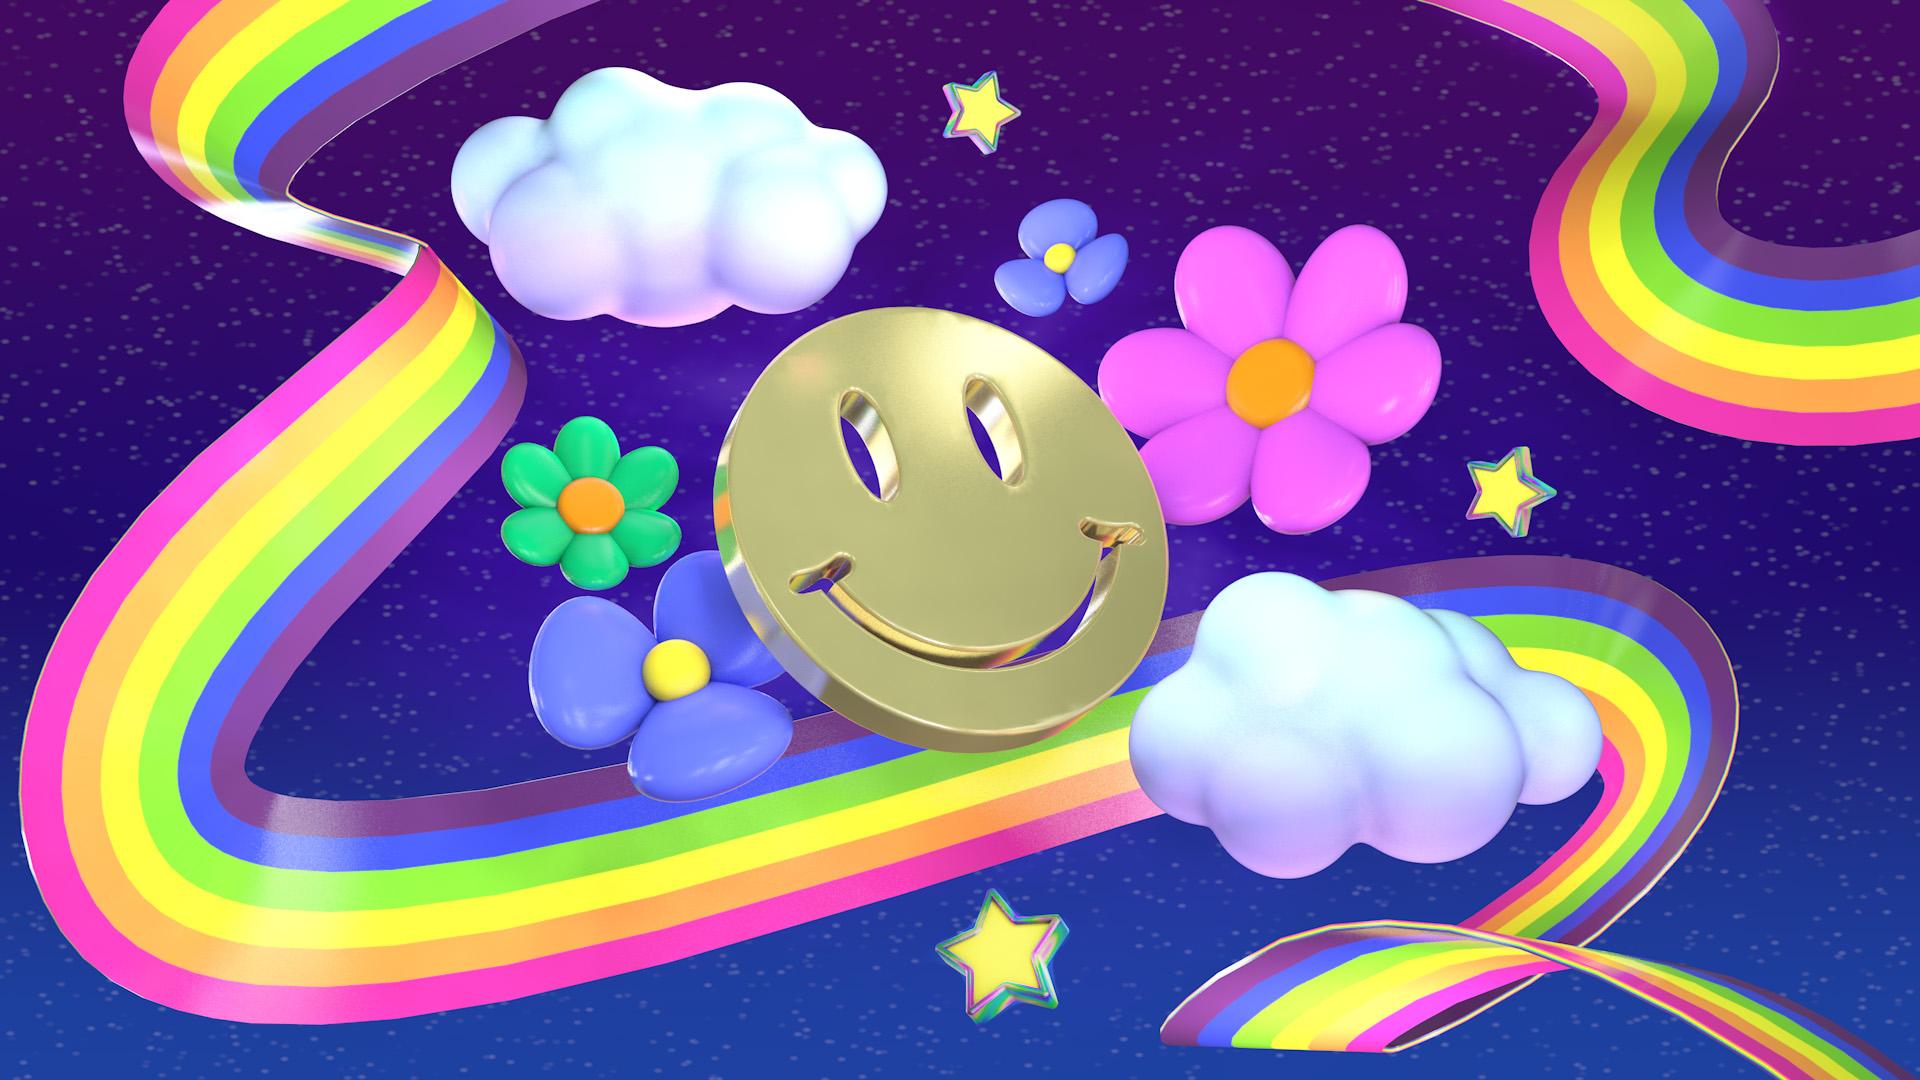 Smiley_R22_Ver_3-edited